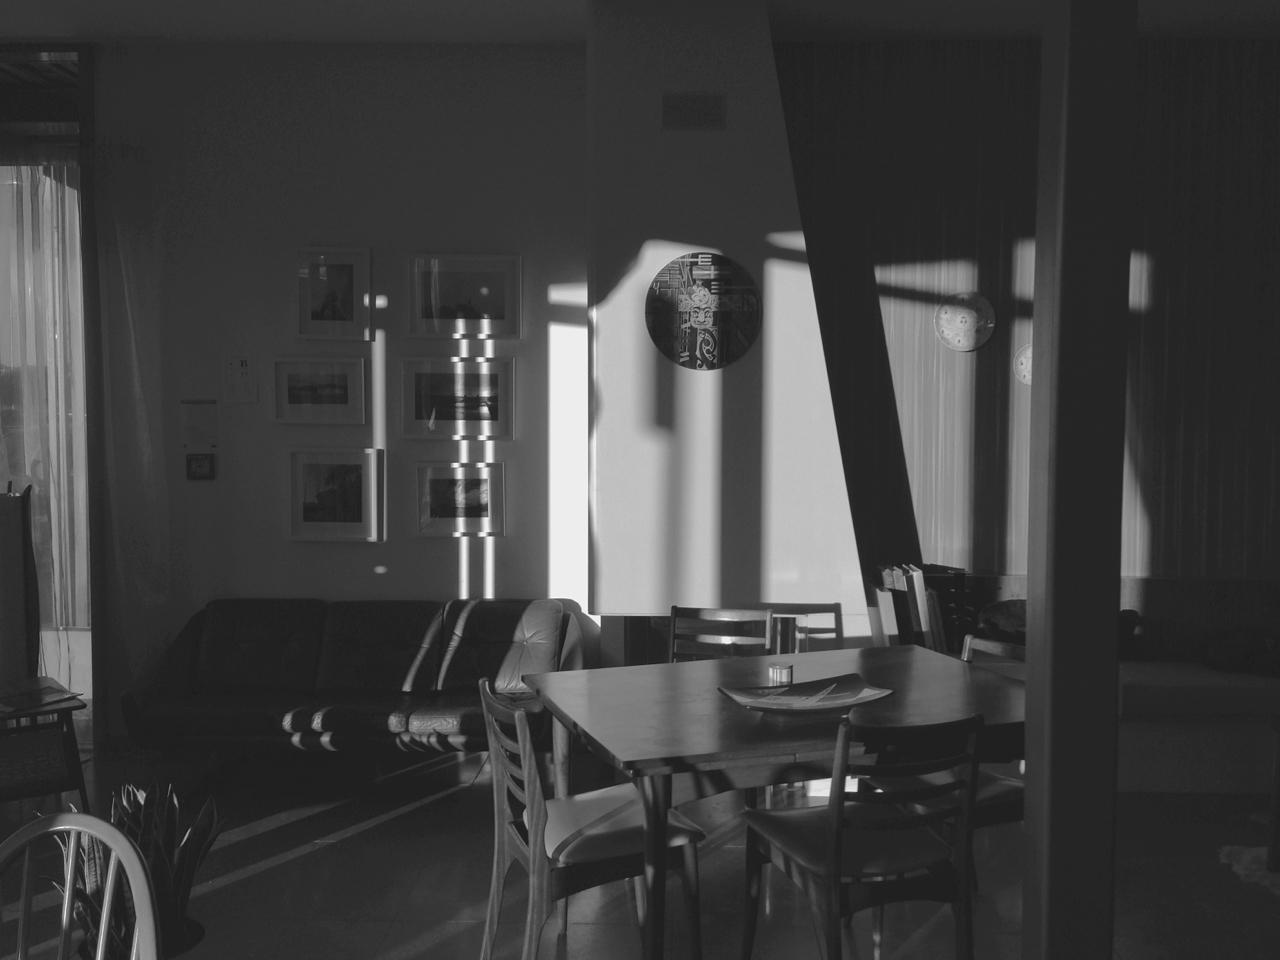 #documentingspace #wellington #bw